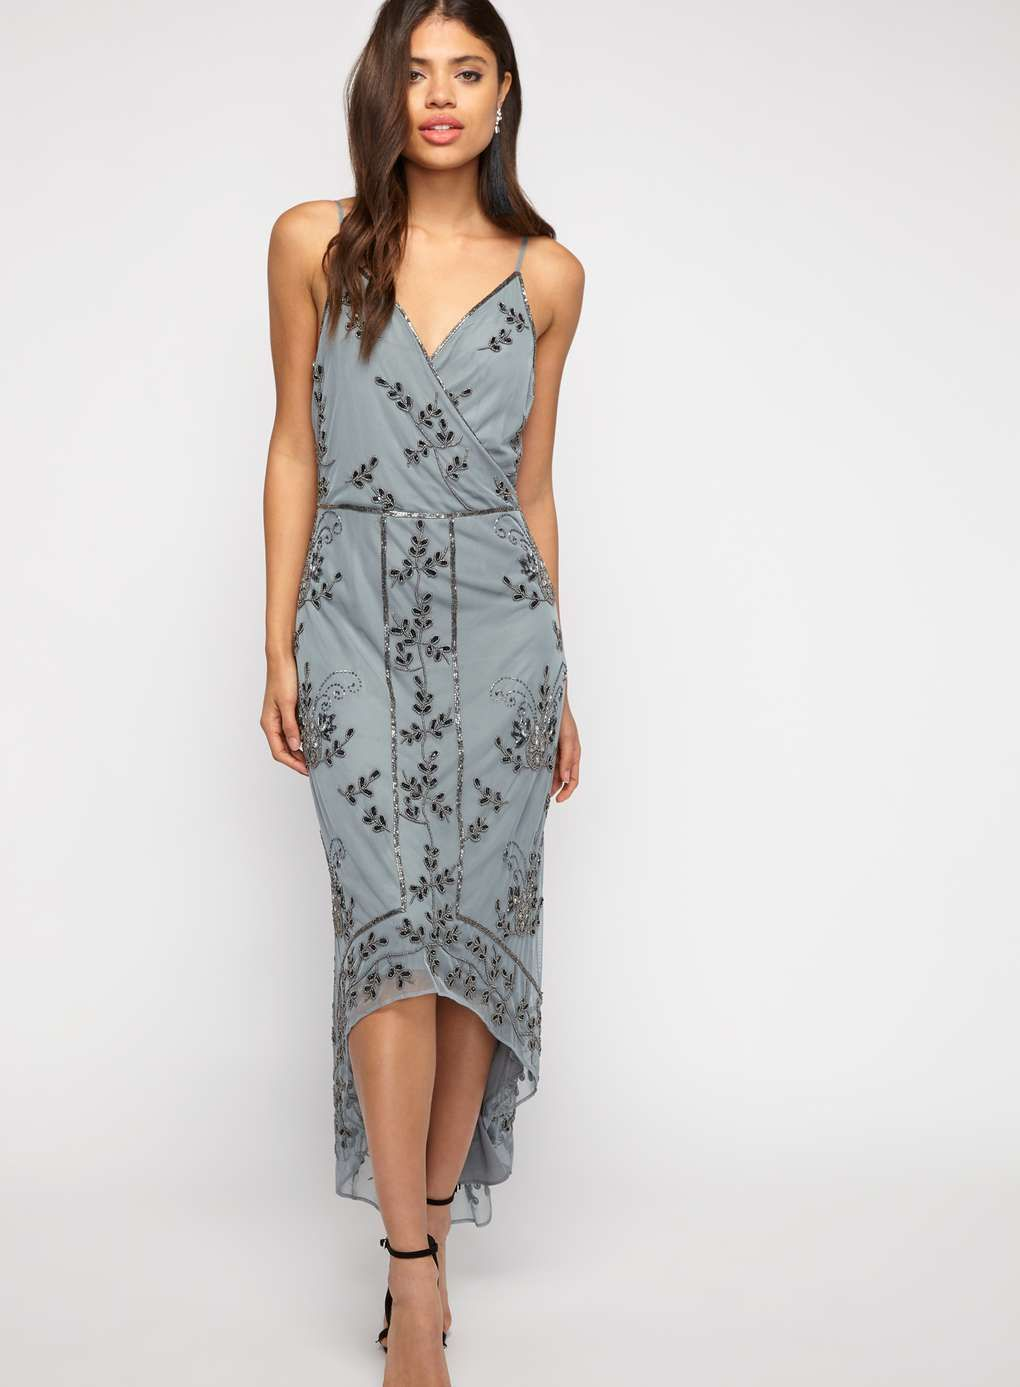 71d45b13d4b2e8 PREMIUM Embellished Wrap Midi Dress - View All - Dress Shop - Miss Selfridge